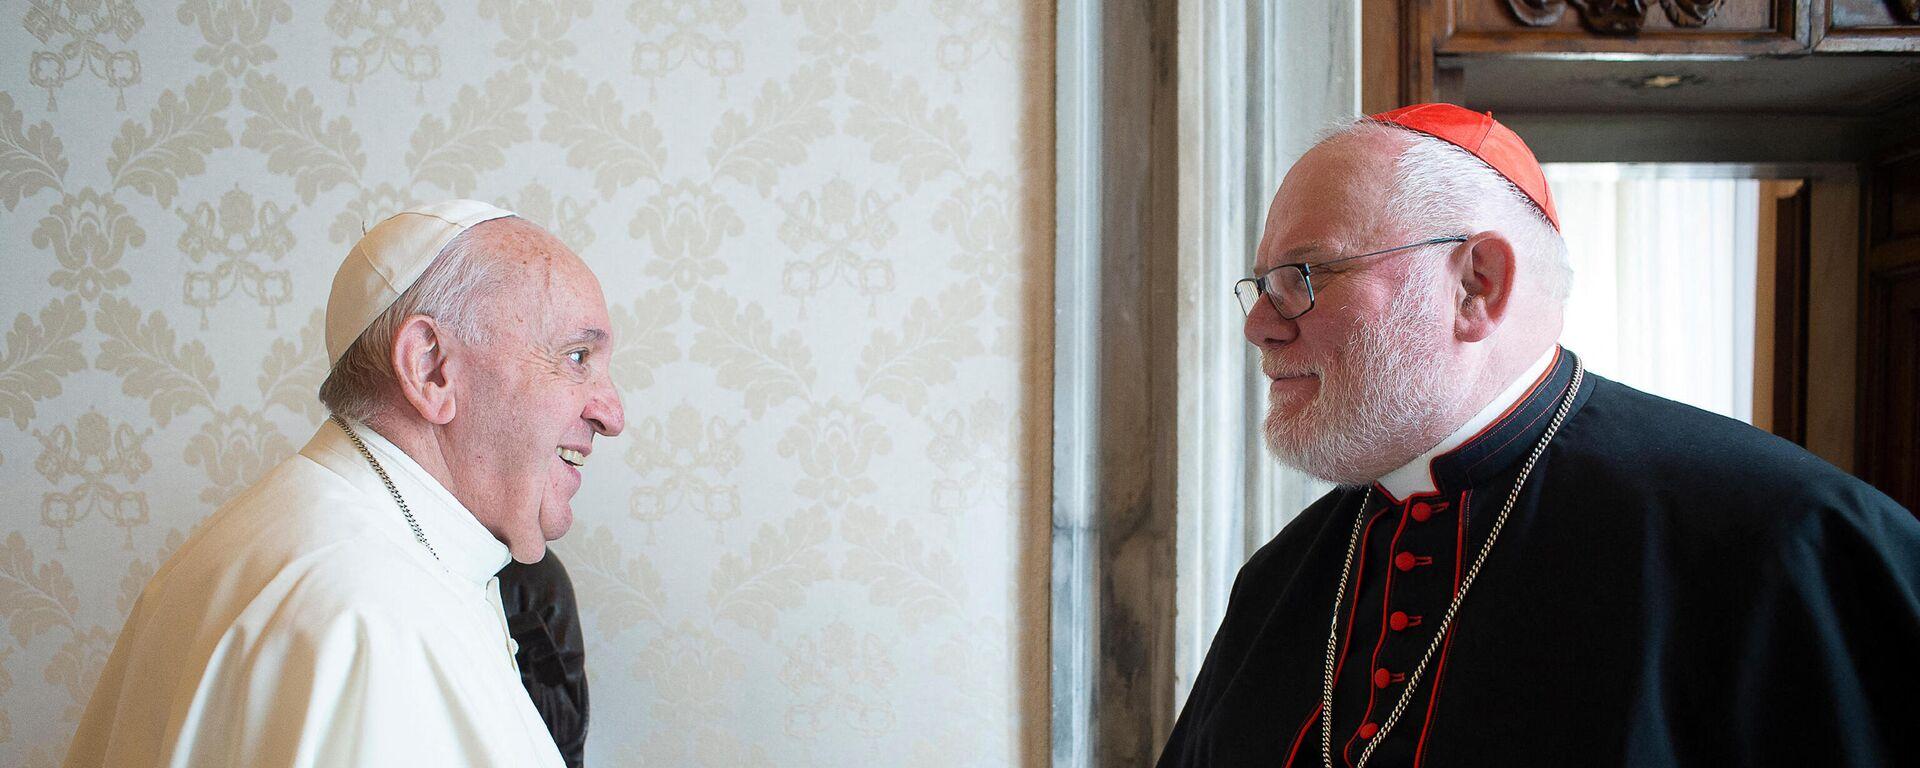 Kardinal Reinhard Marx und Papst Franziskus - SNA, 1920, 27.04.2021